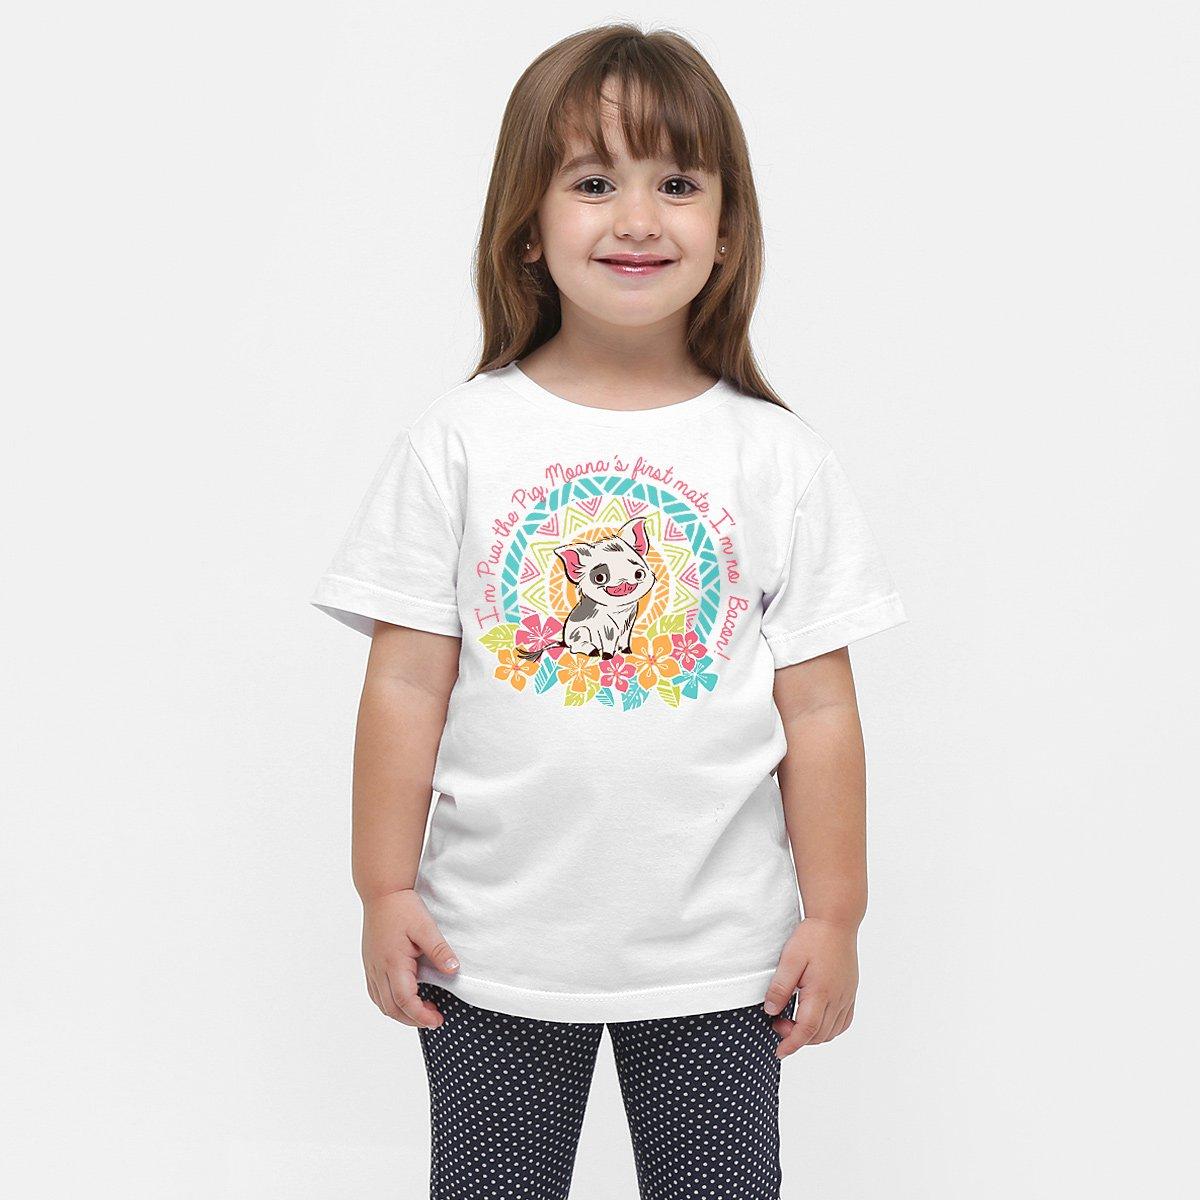 Camiseta Moana Pua Camiseta Branco Infantil Branco Pua Infantil Moana Camiseta YwY1q